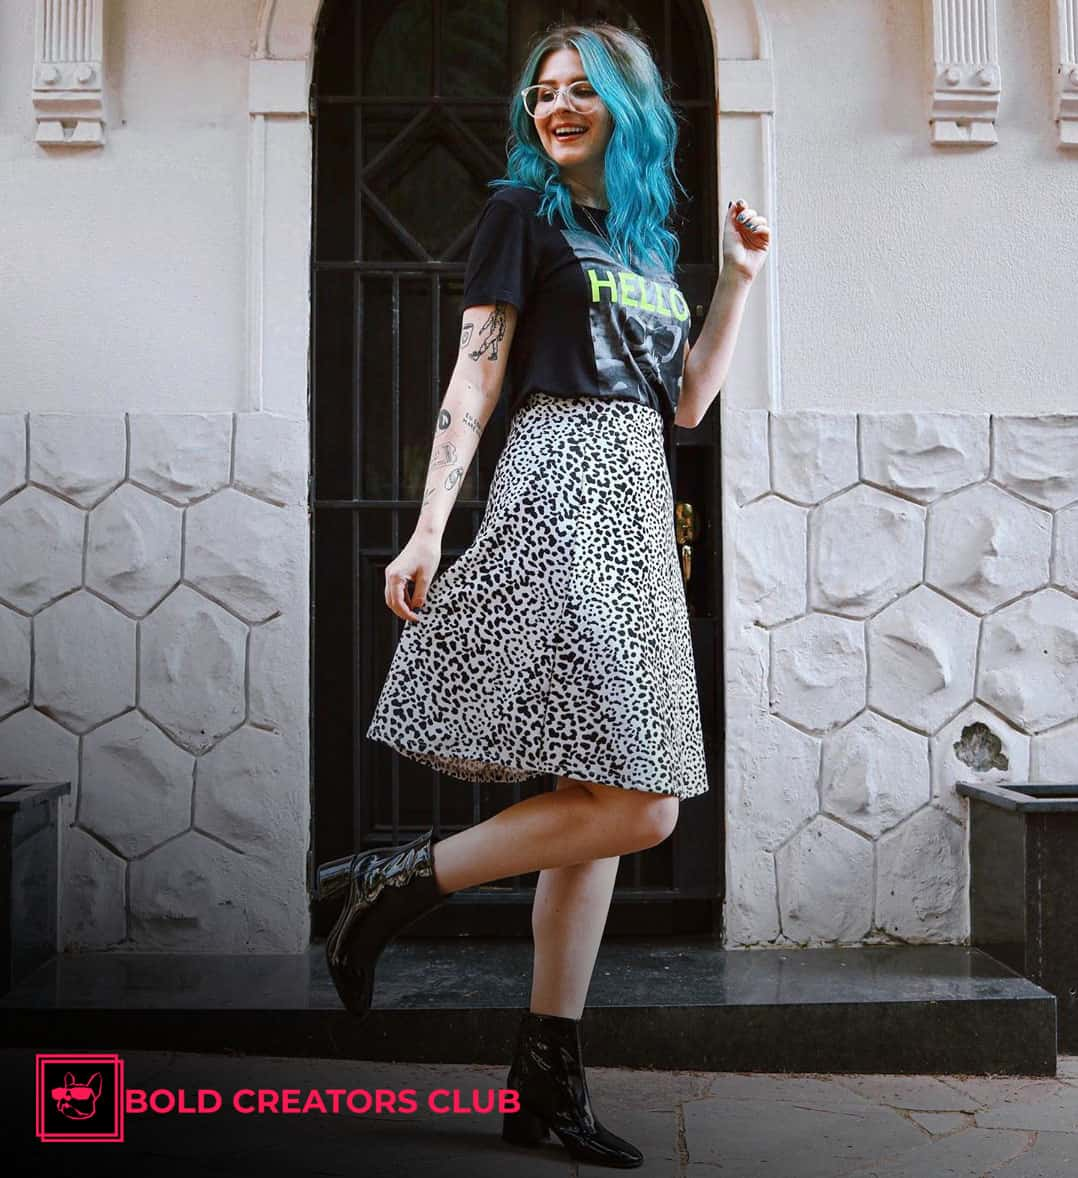 Camila Rech Bold Creators Club Influencer Marketing Agency South America Brazil